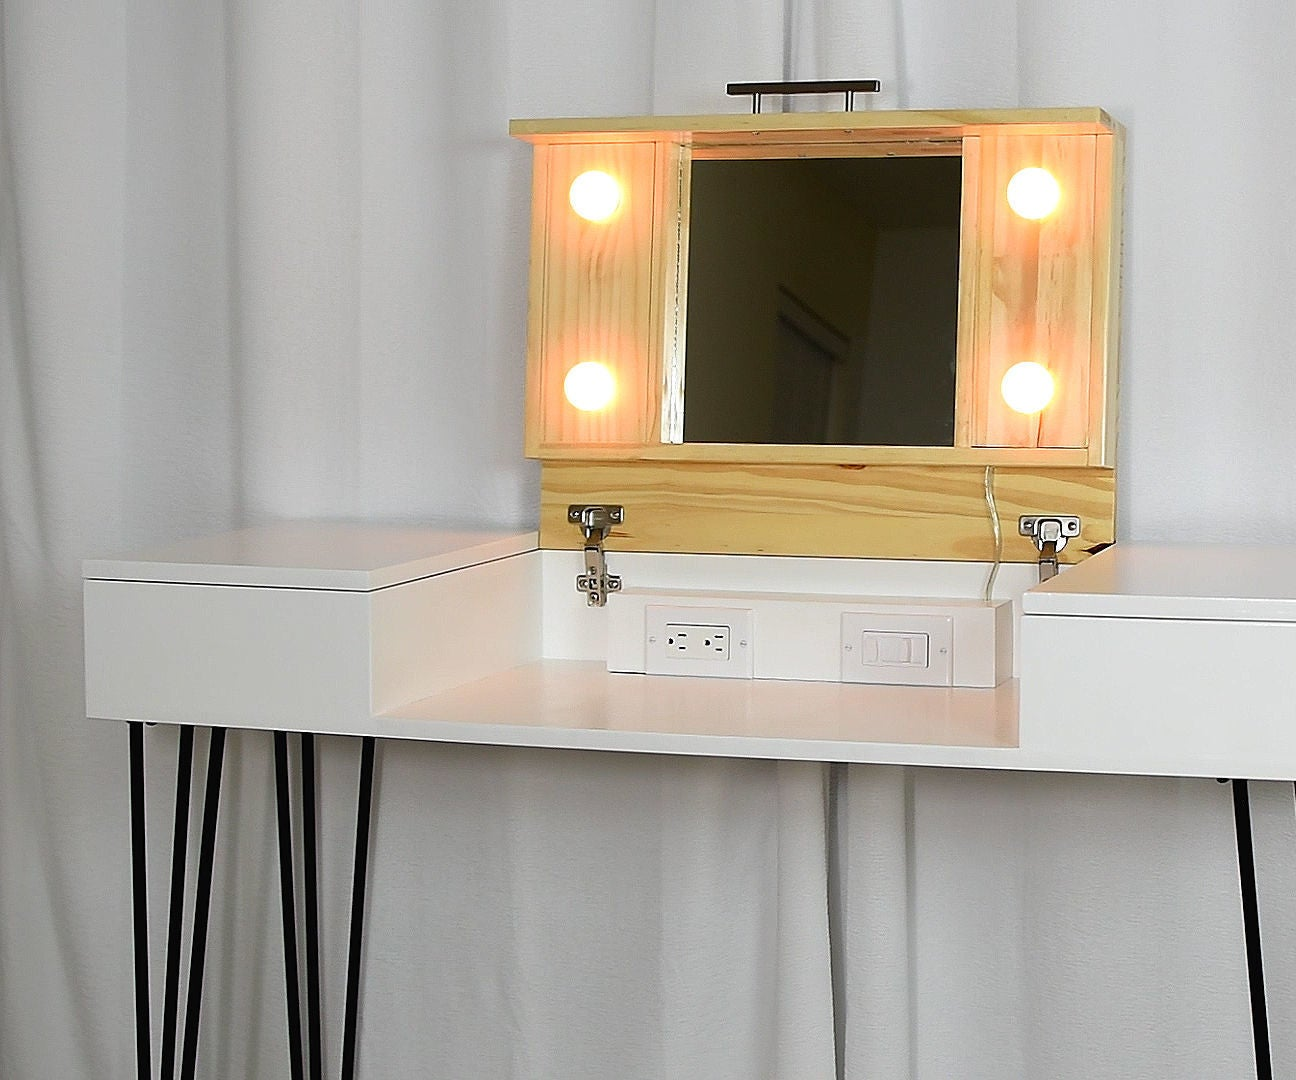 Diy Makeup Vanity Desk 9 Steps With Pictures Instructables